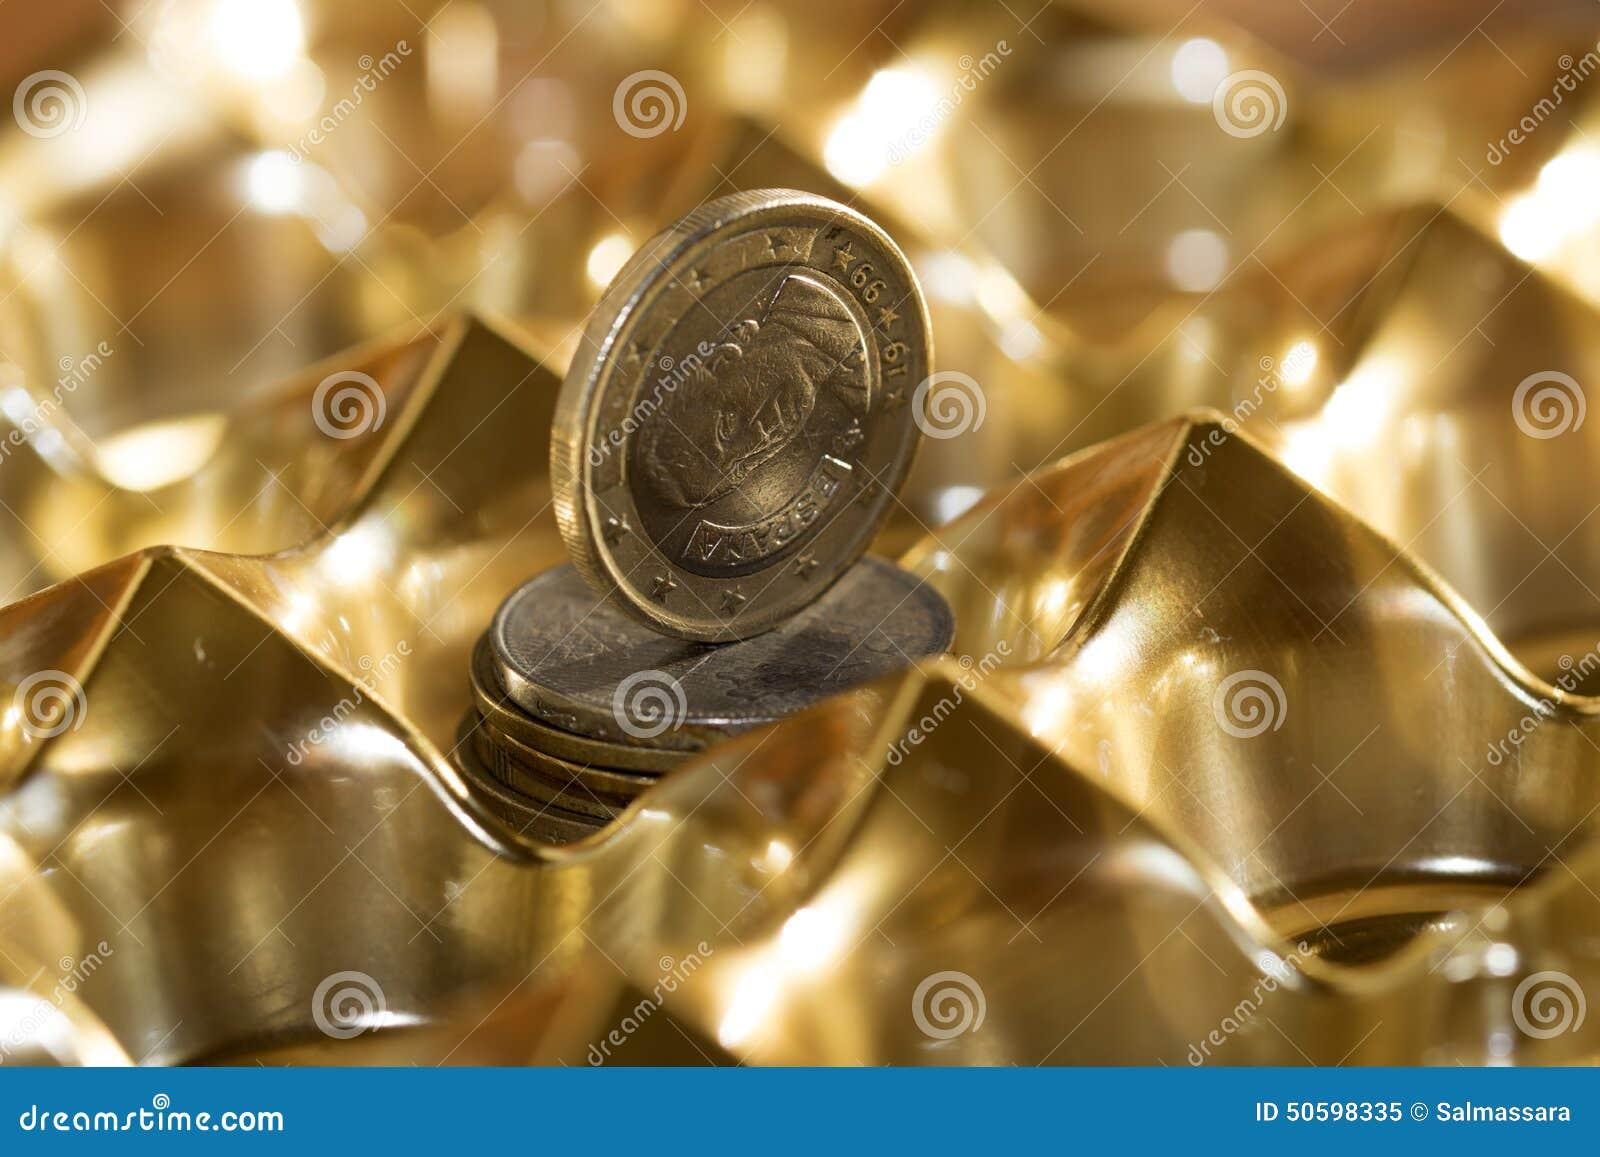 Monetair stelsel